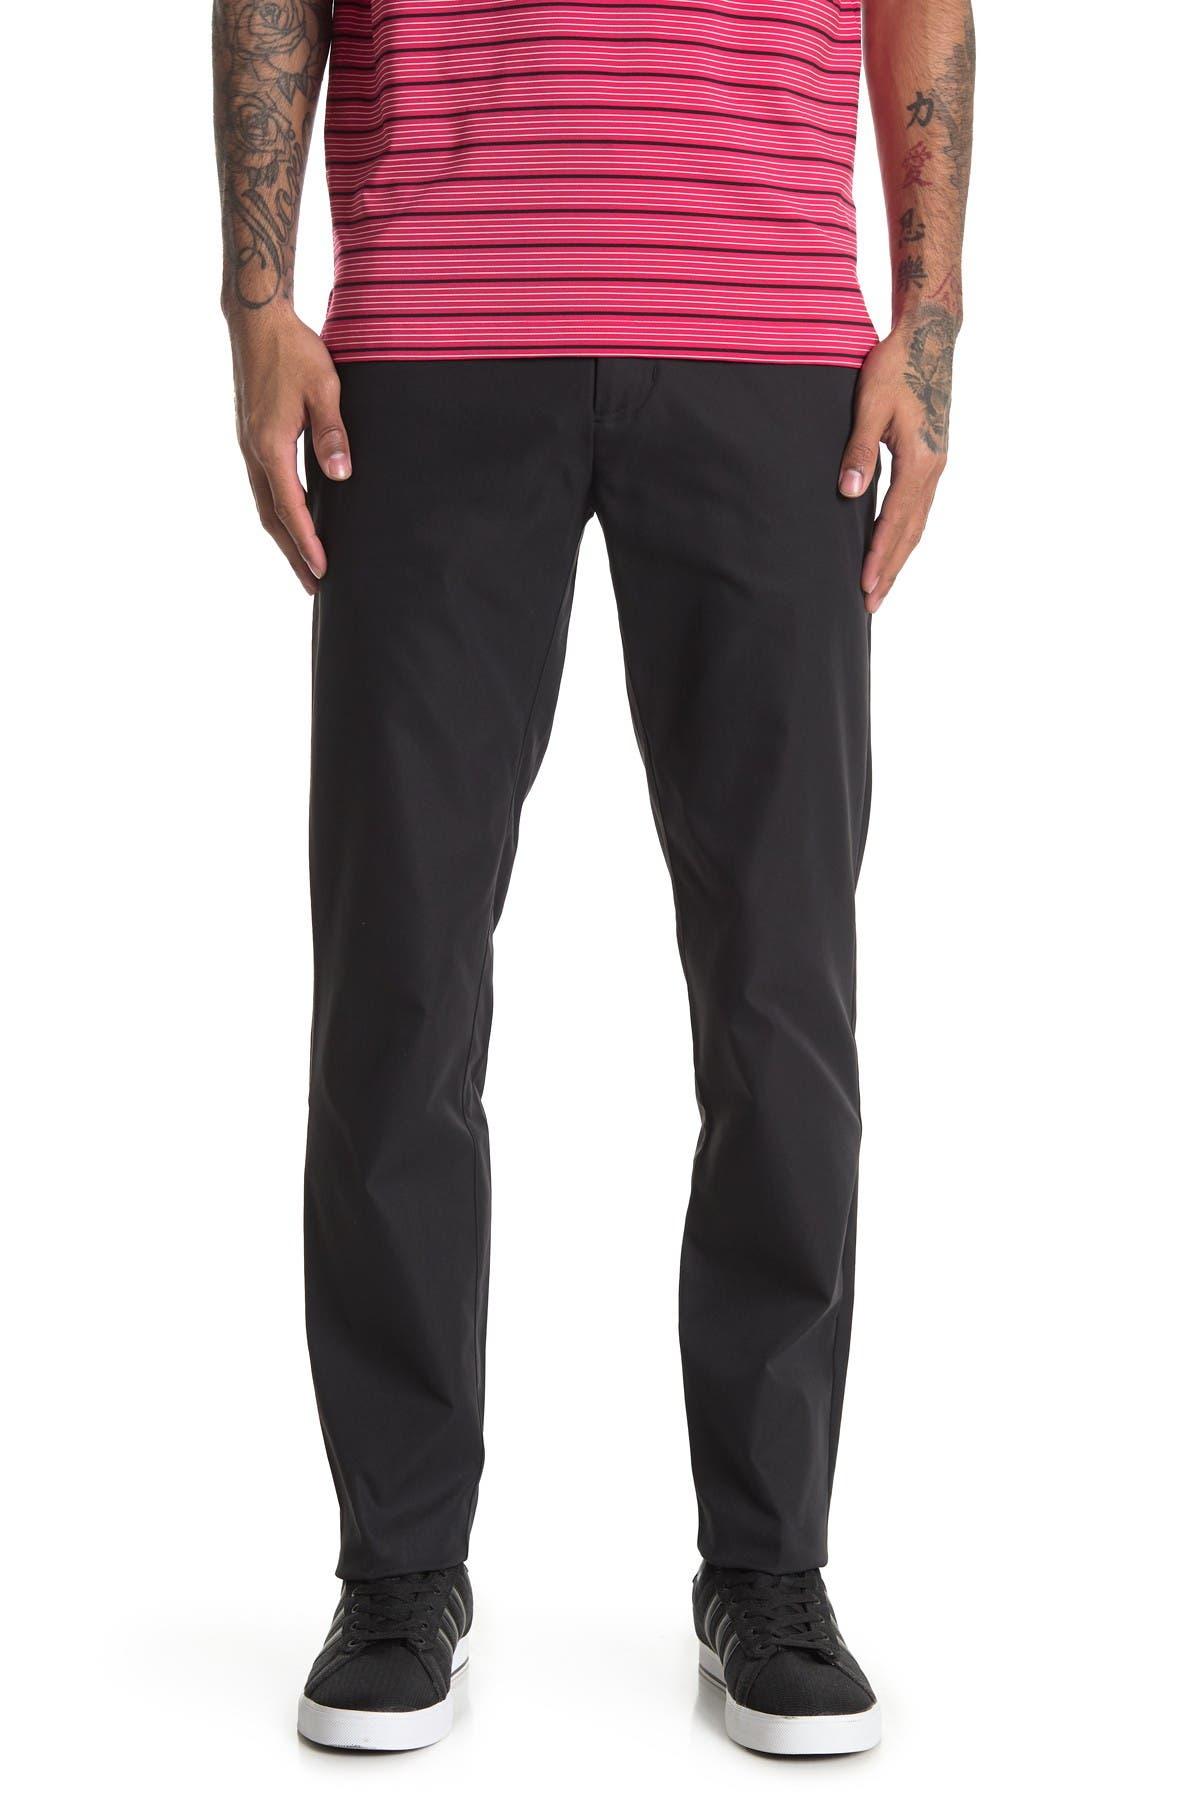 Image of Adidas Golf Adipure Five Pocket Golf Pants